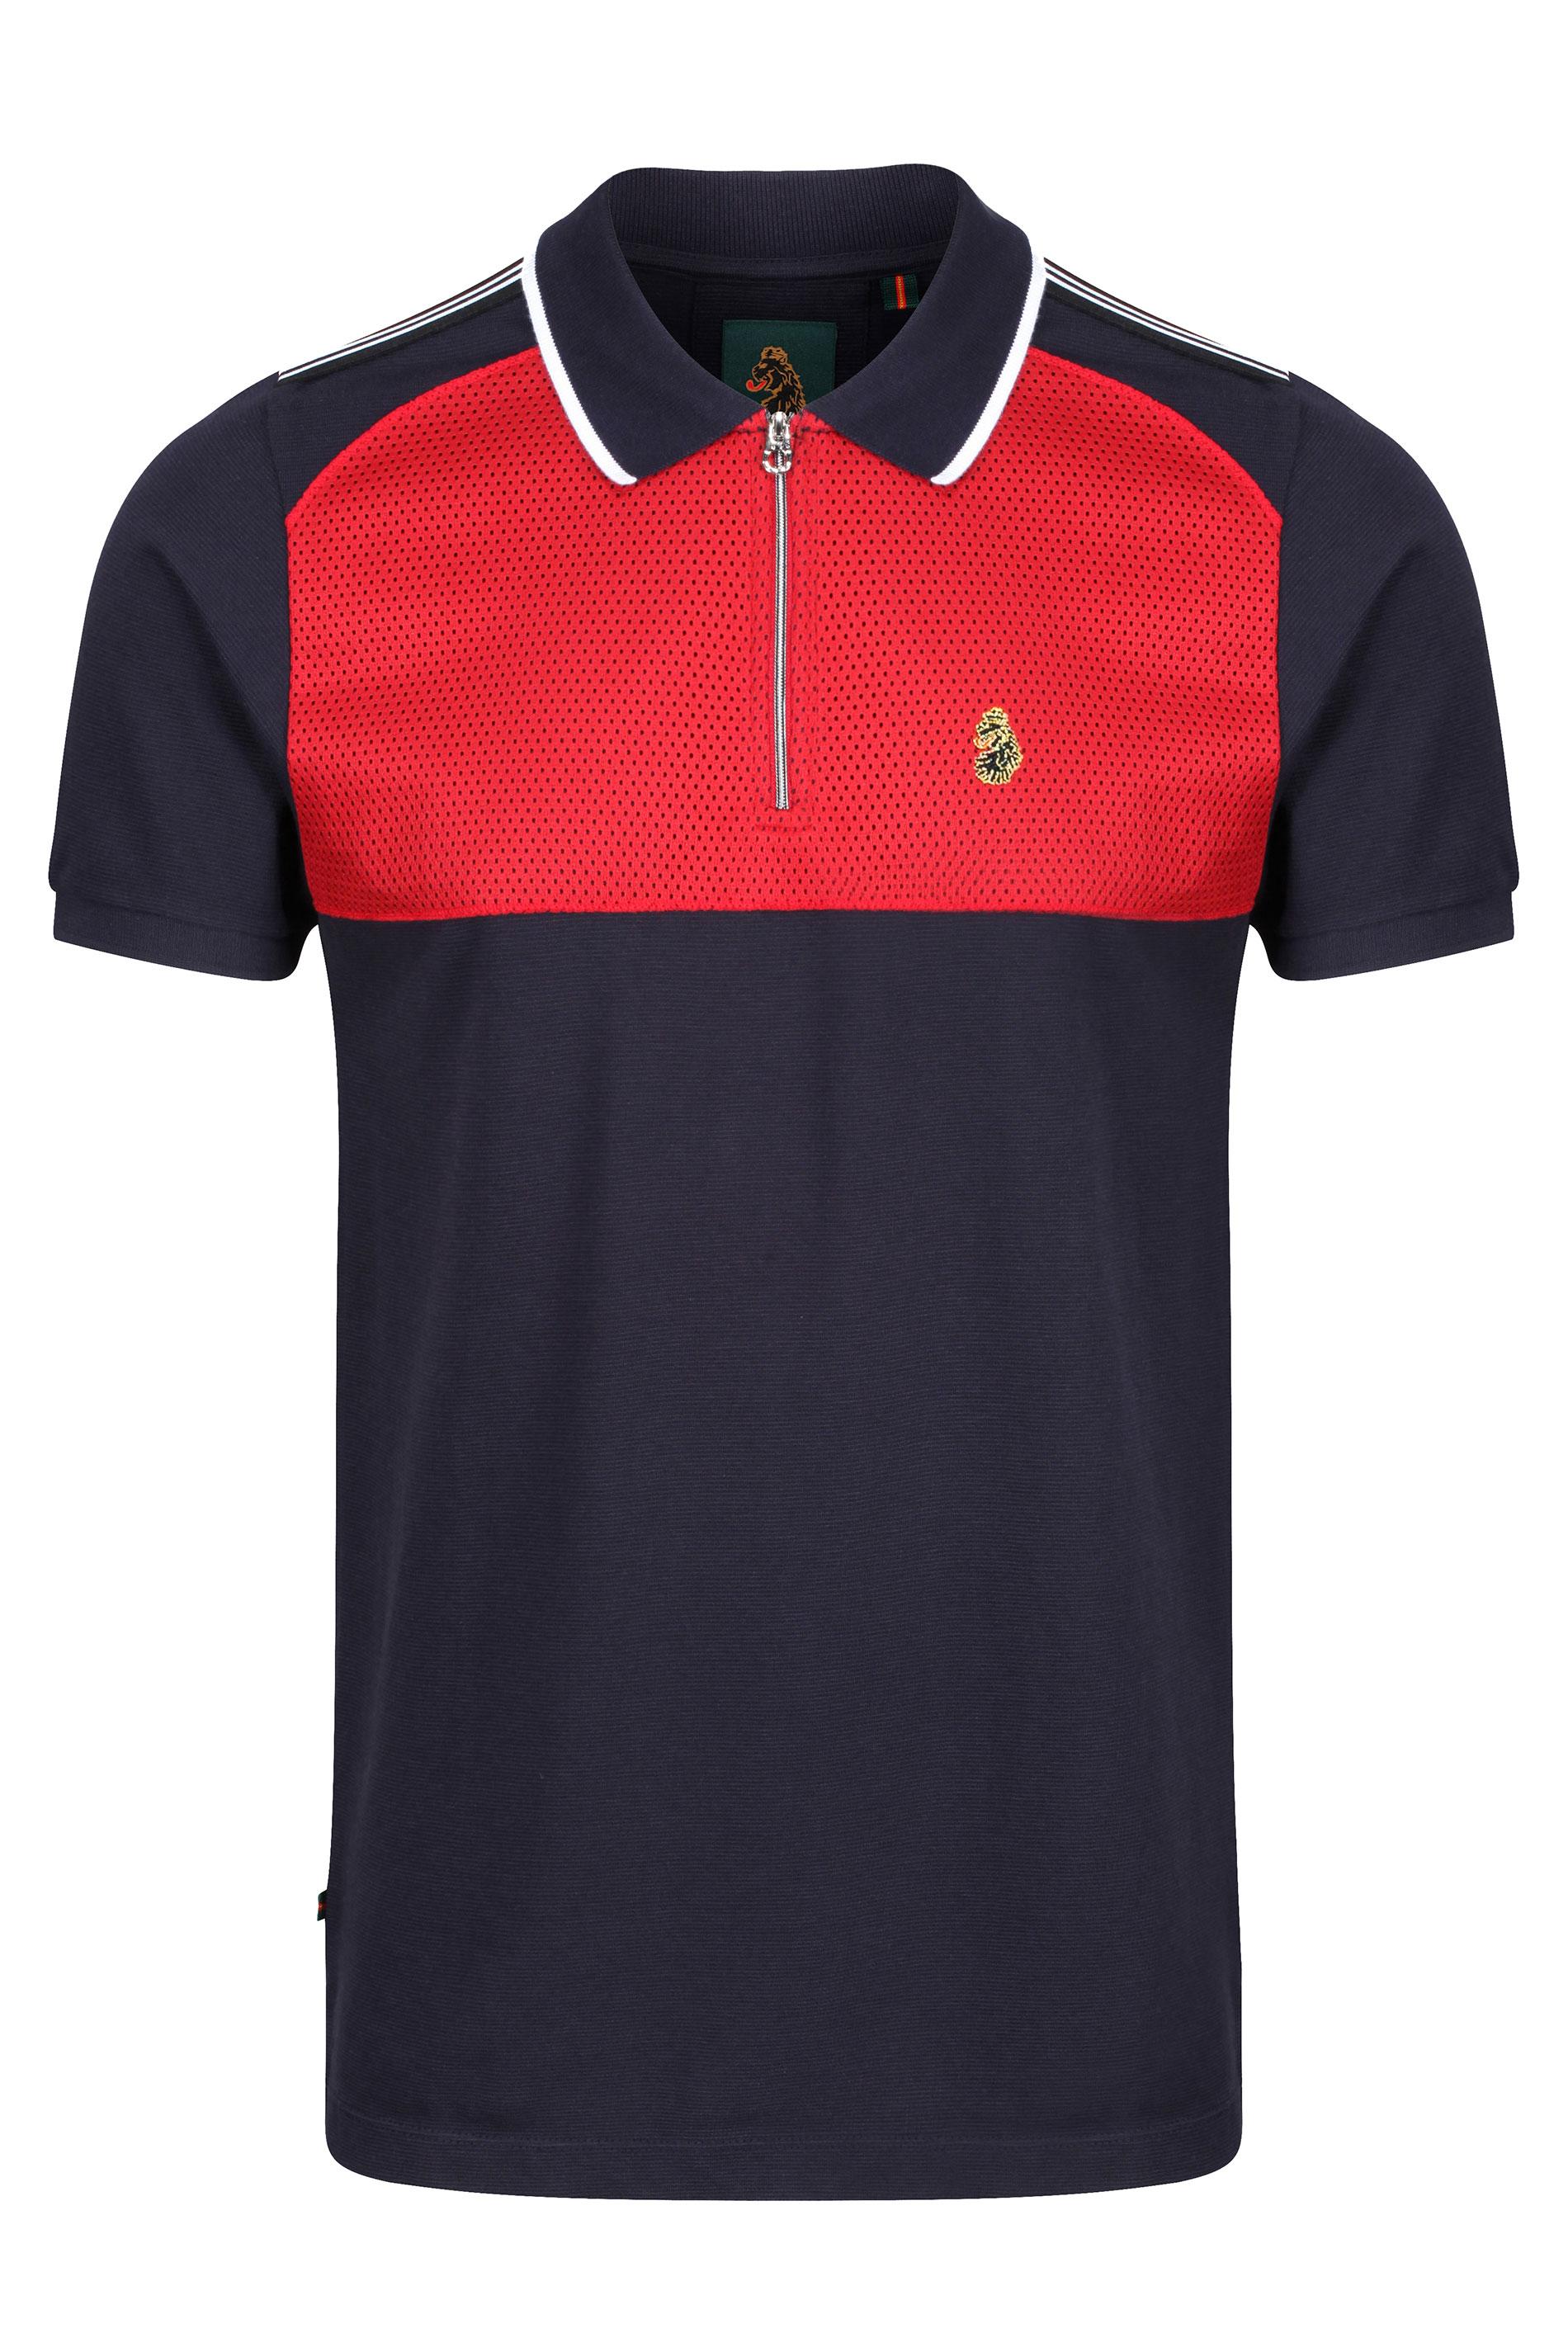 LUKE 1977 Navy Lorenzo Polo Shirt_F.jpg